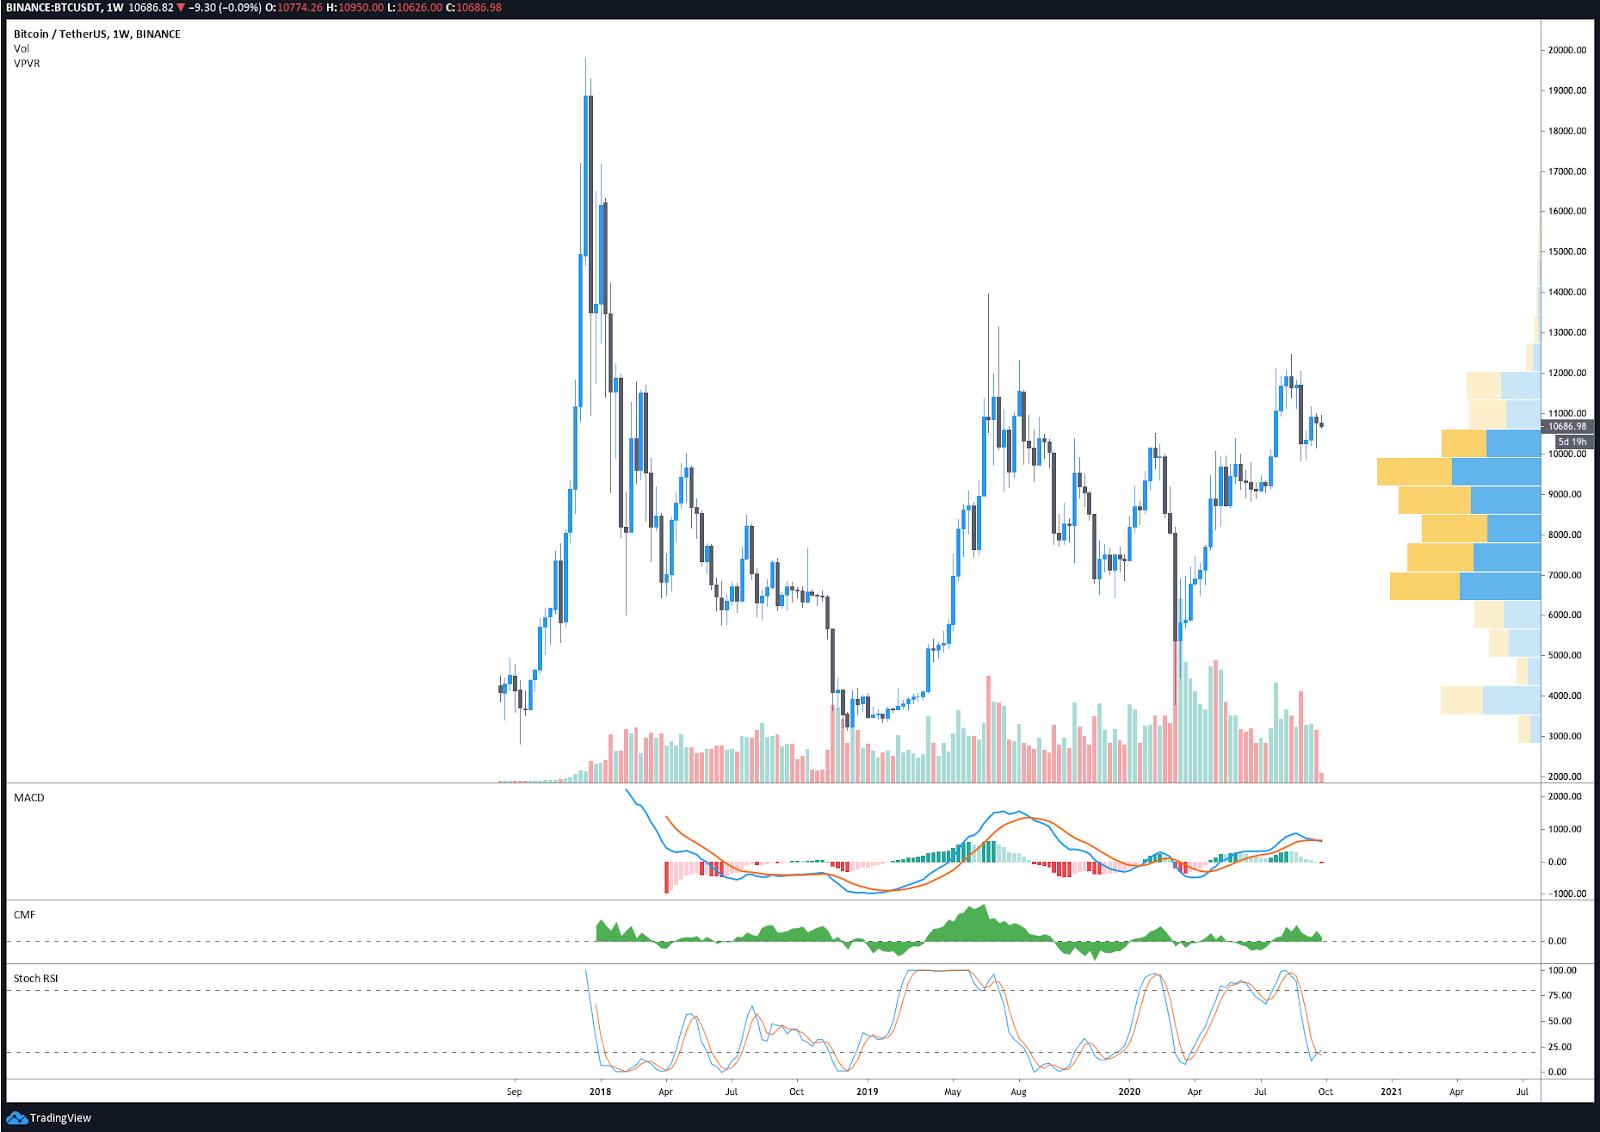 BTC/USDT weekly chart